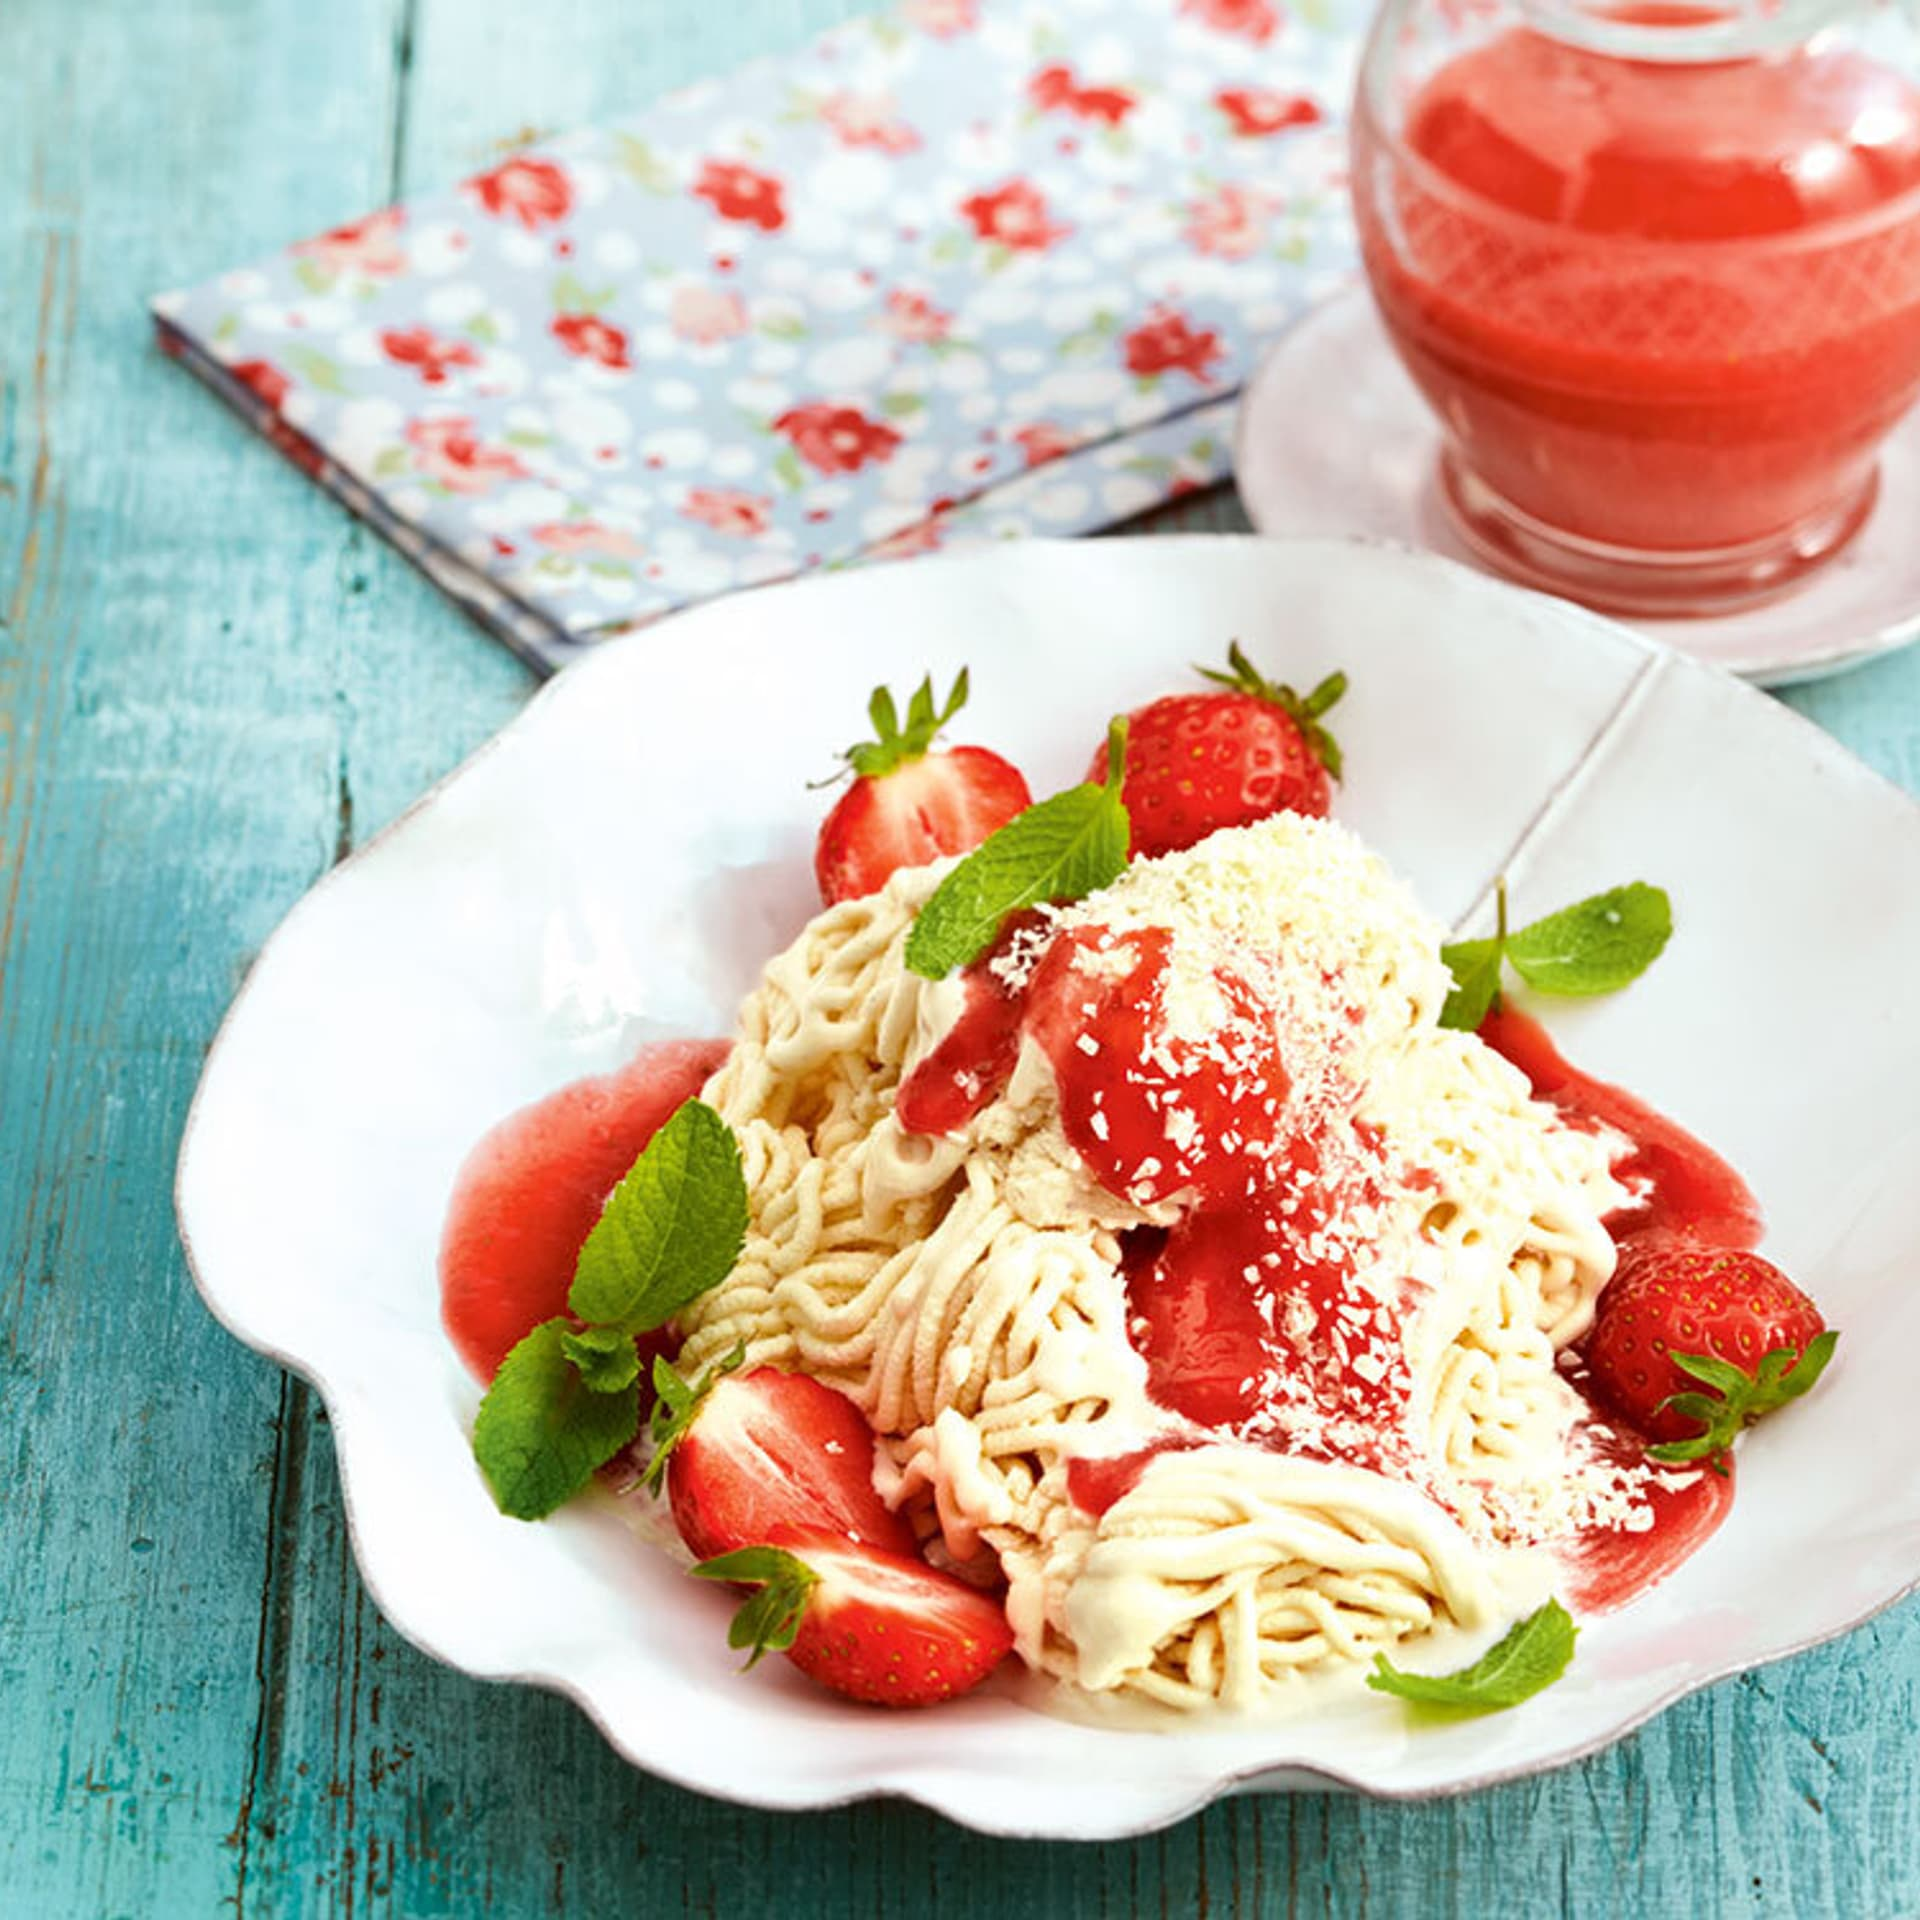 Spaghetti eis mit erdbeersauce